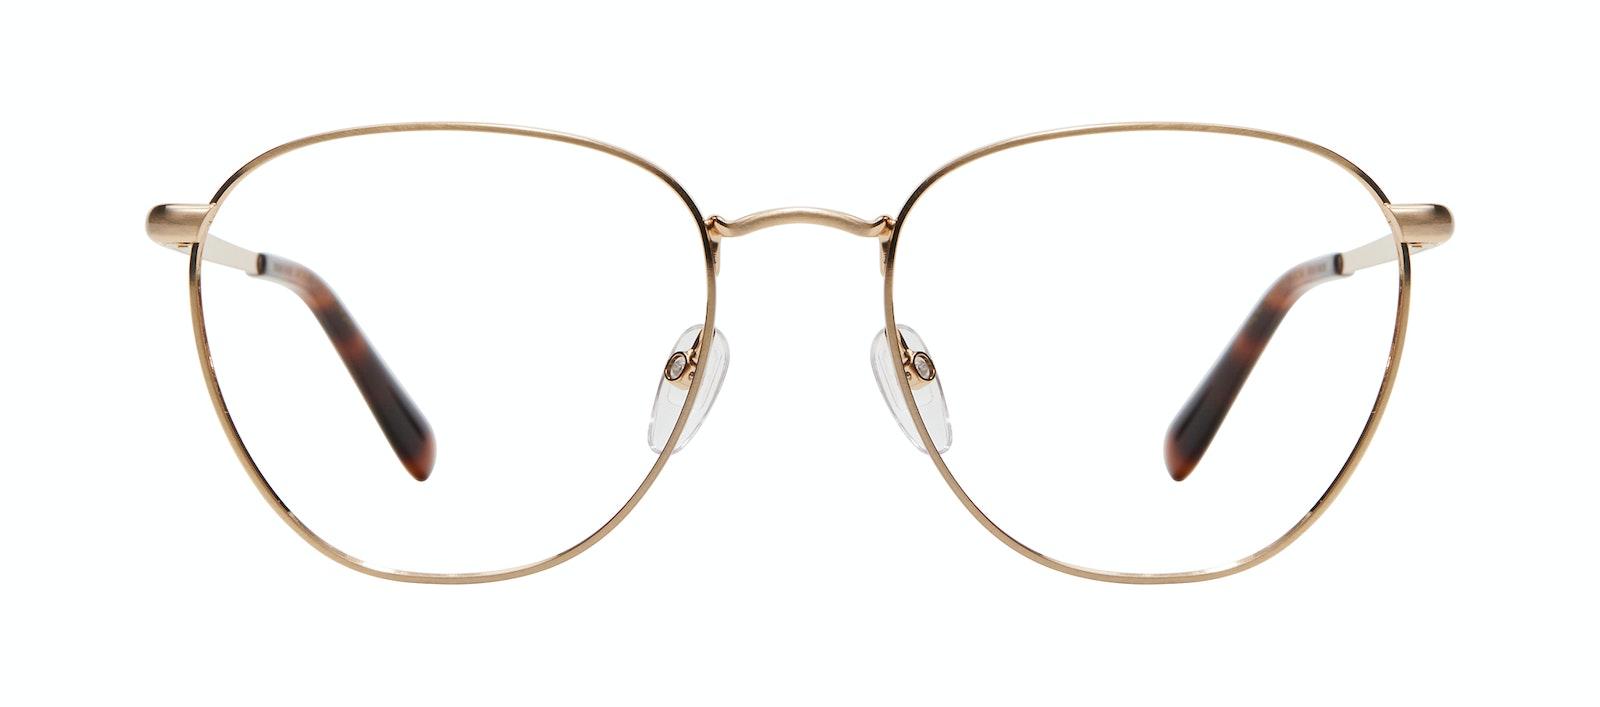 Affordable Fashion Glasses Round Eyeglasses Women Radiant Matte Gold Front